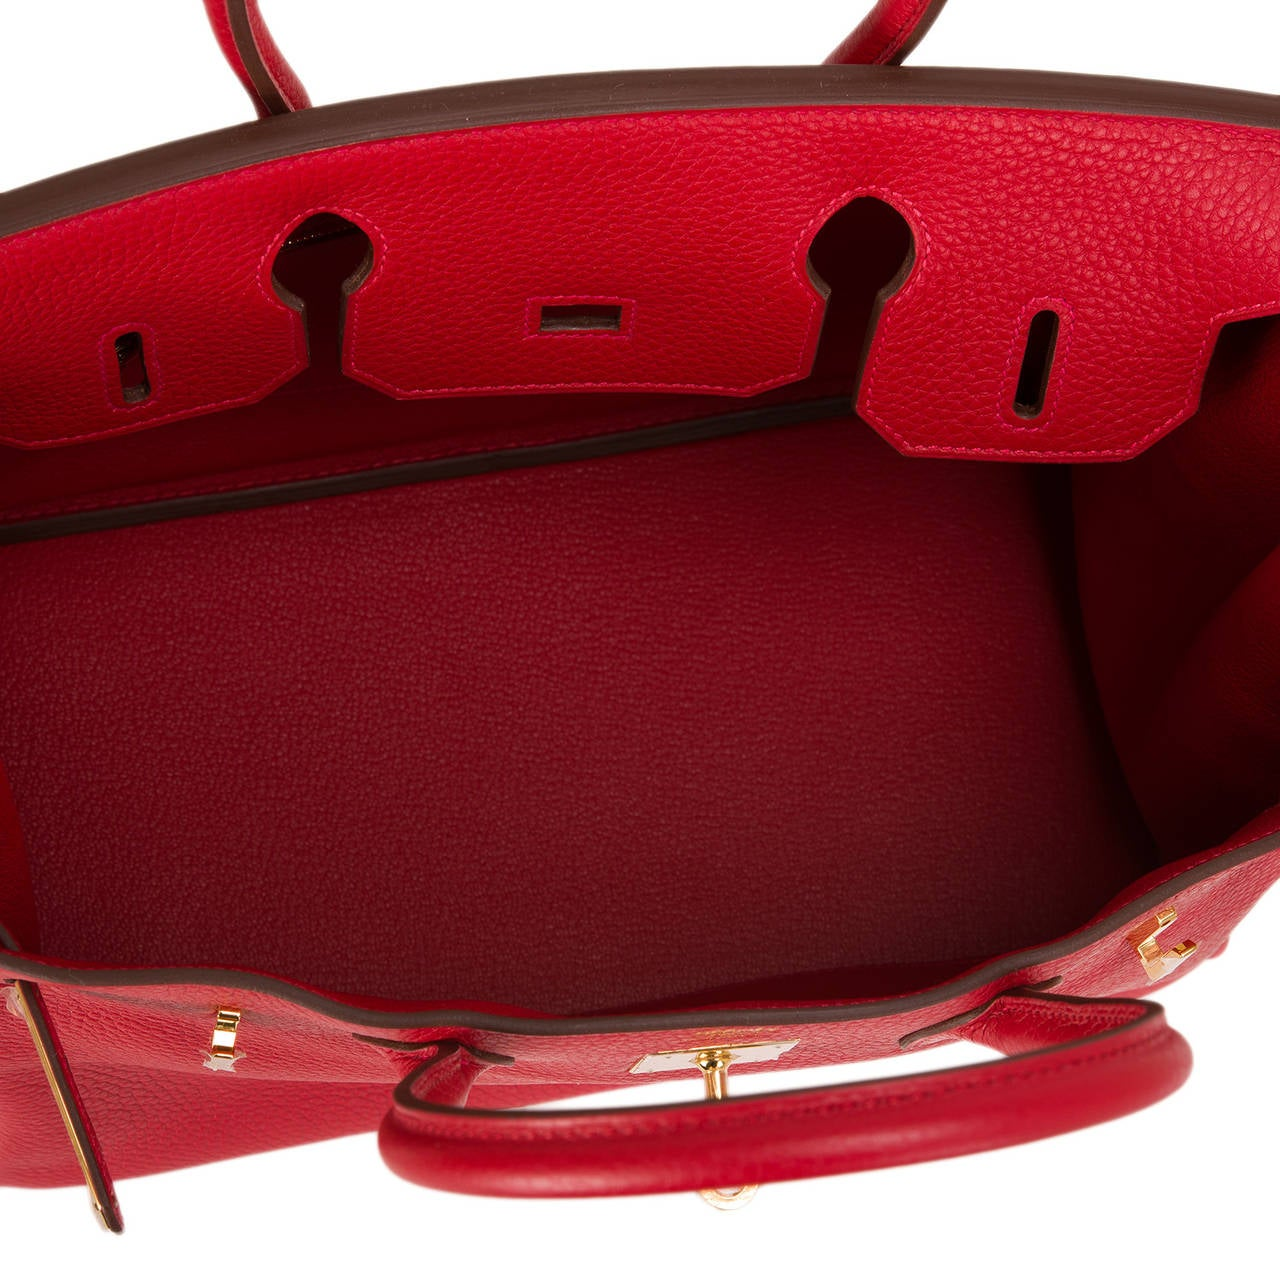 faux croc handbags - hermes rouge casaque leather birkin 30cm gold hardware, hermes ...